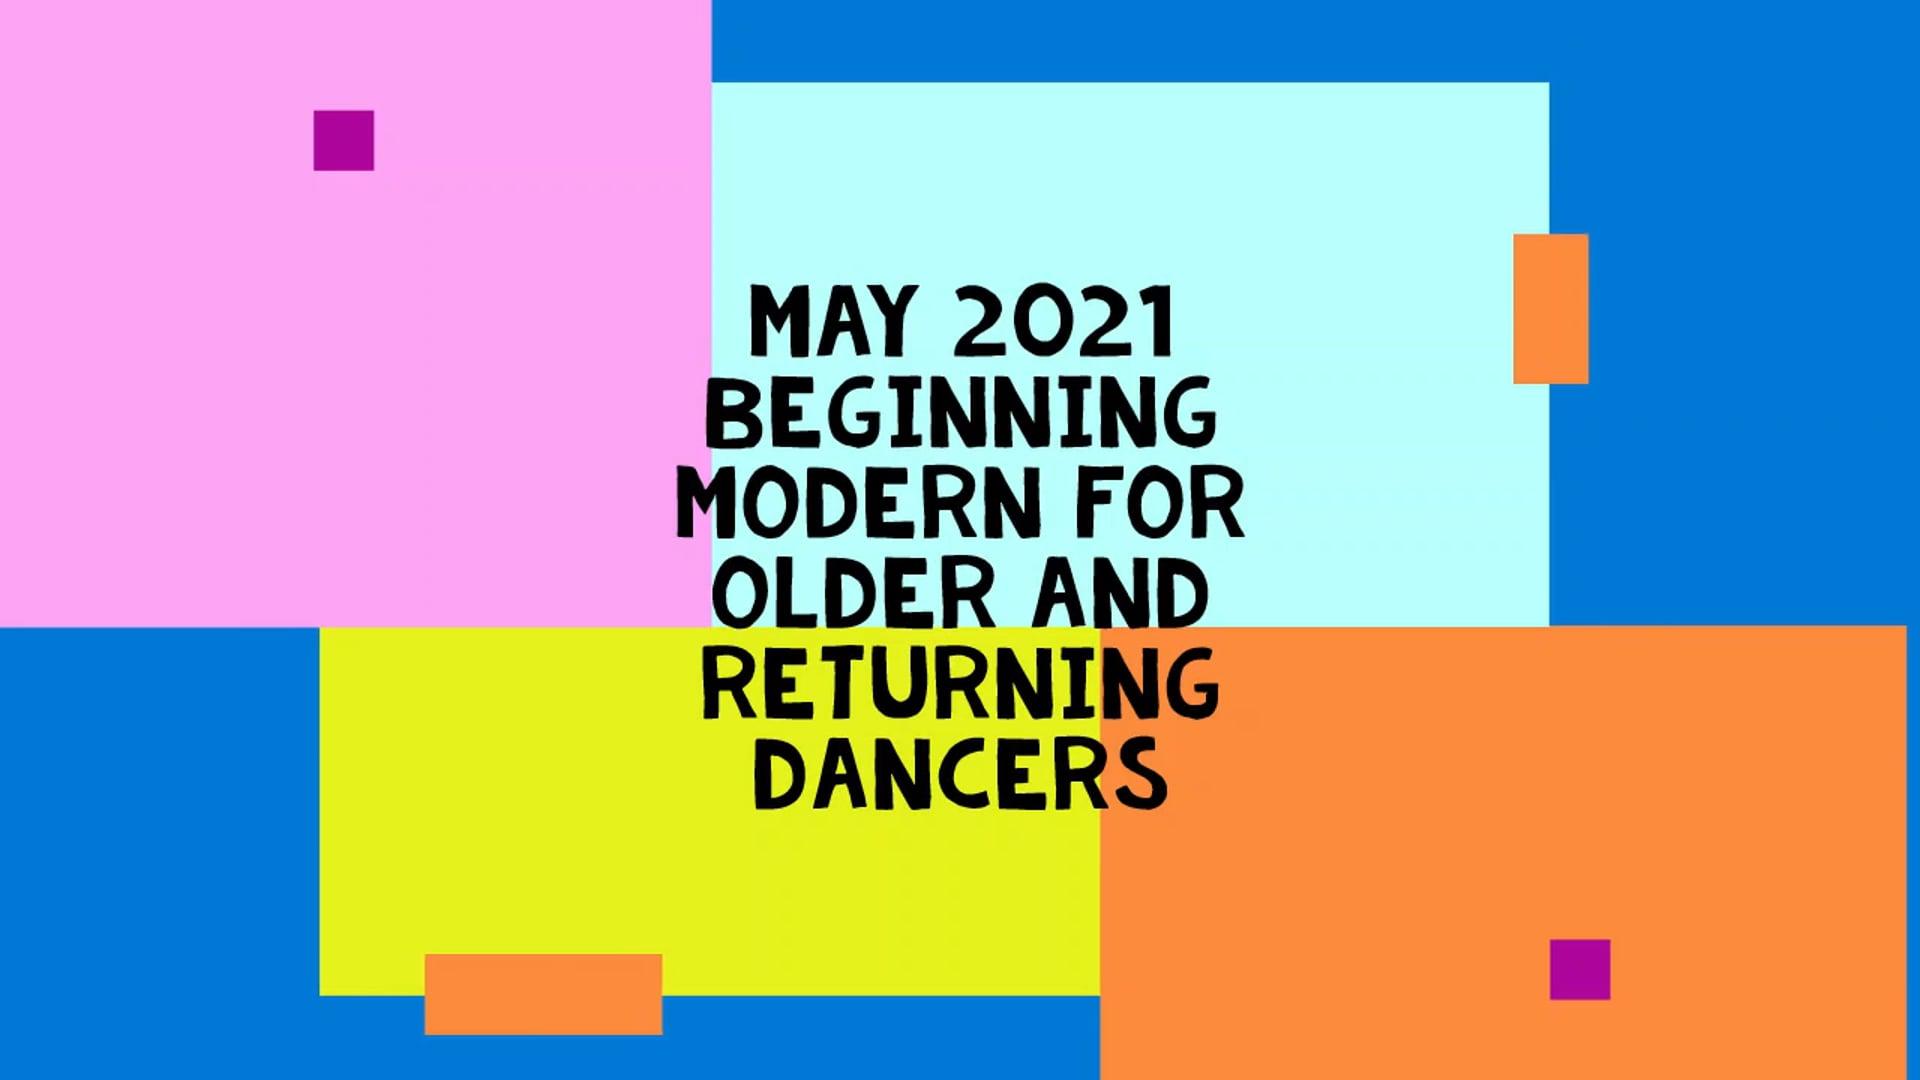 May 2021 Beginning Modern Dance for 50+